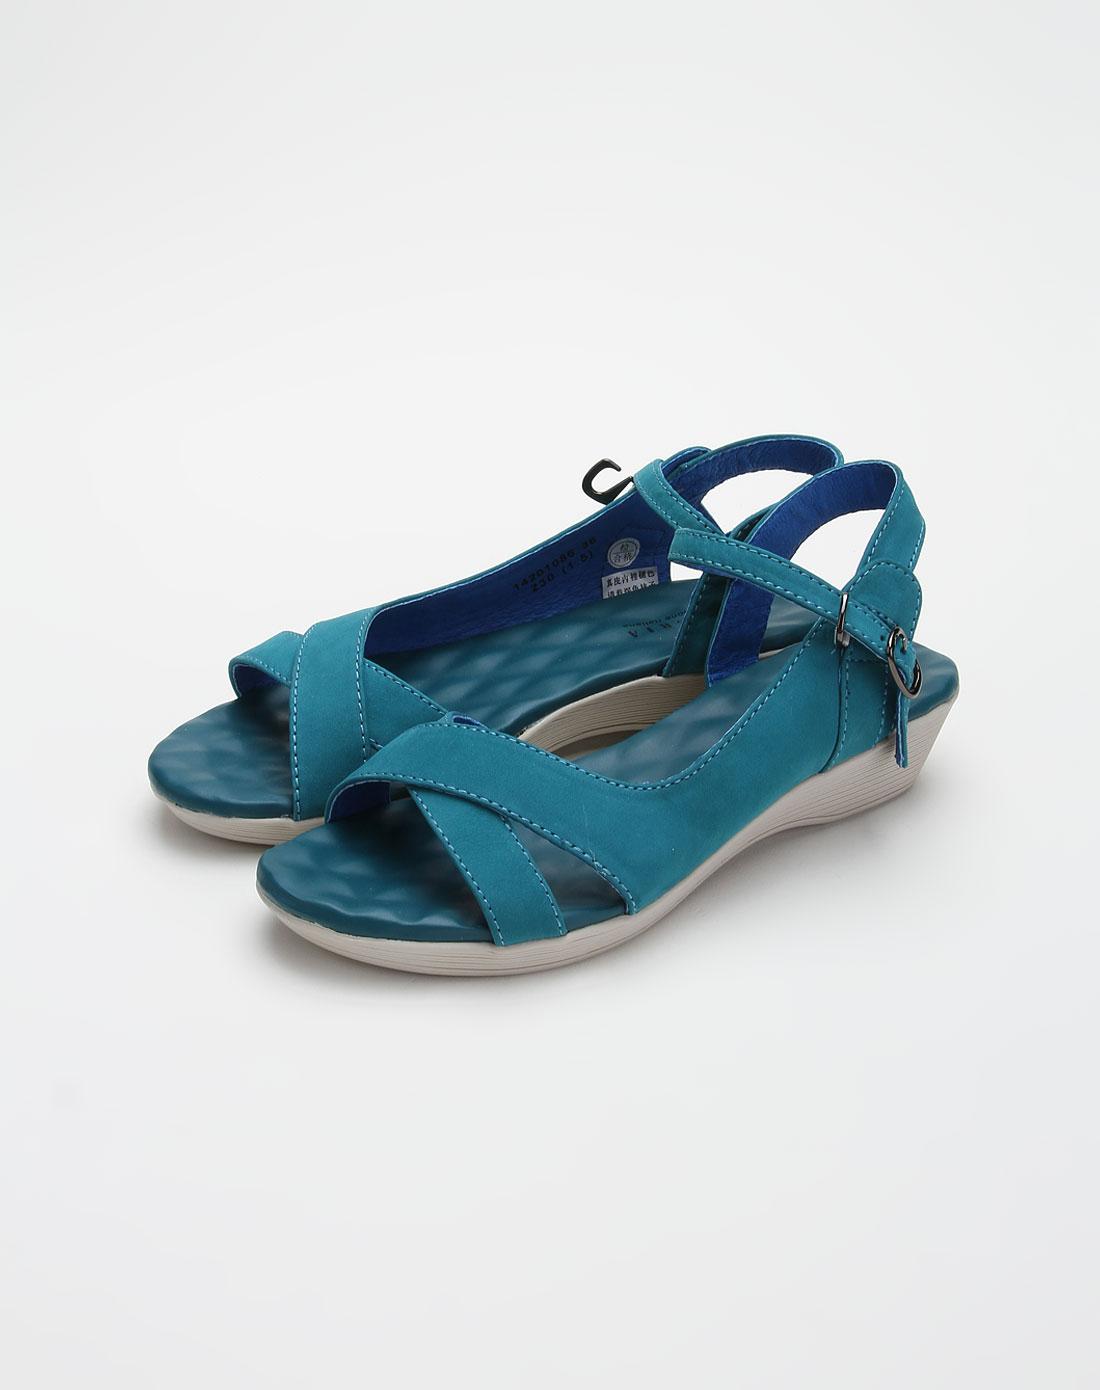 奥卡索forleria(法娜妮)浅墨绿色舒适凉鞋